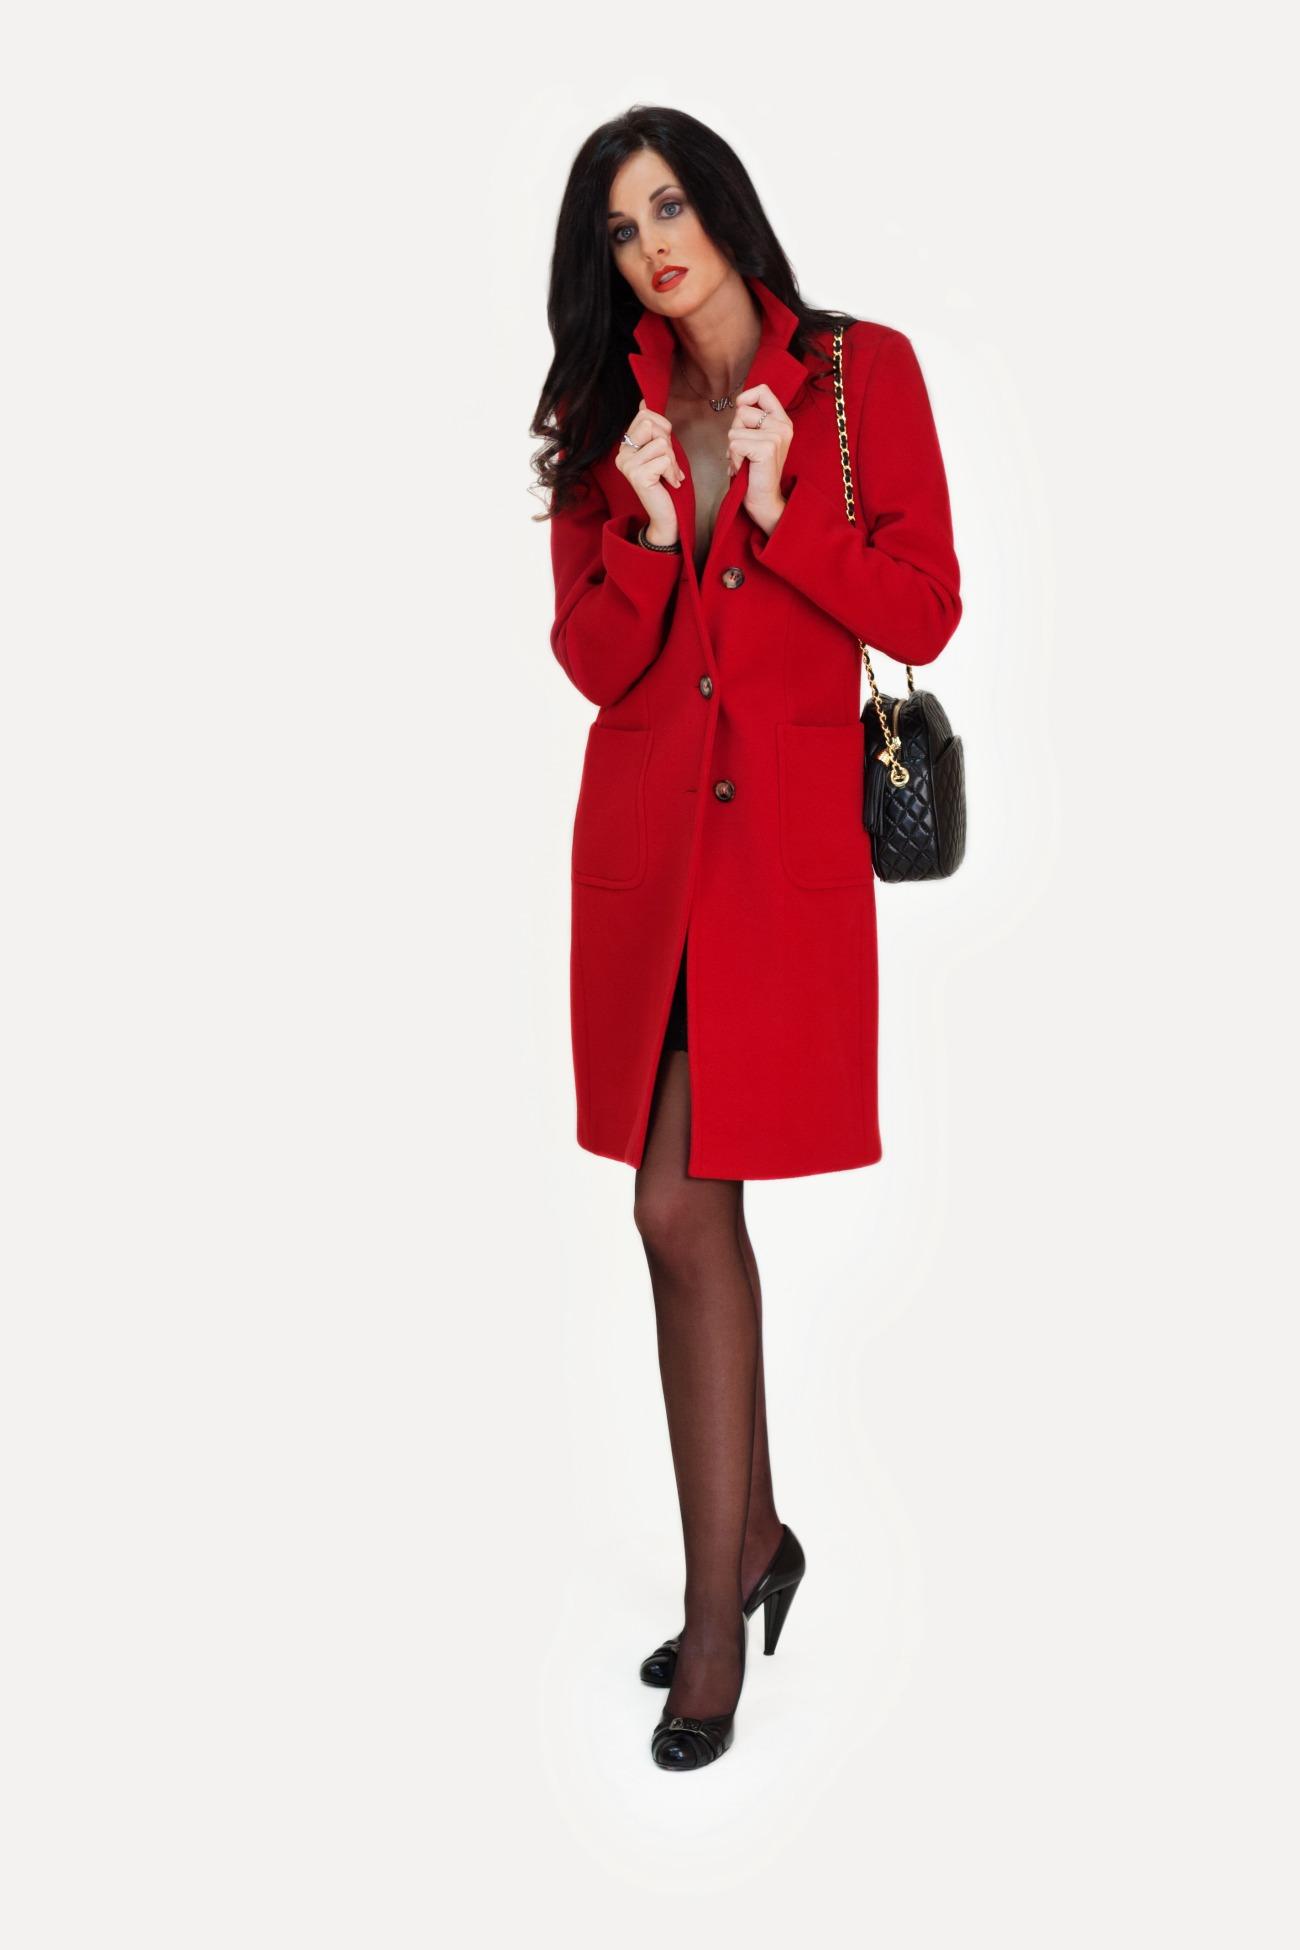 cappotti donna summisura